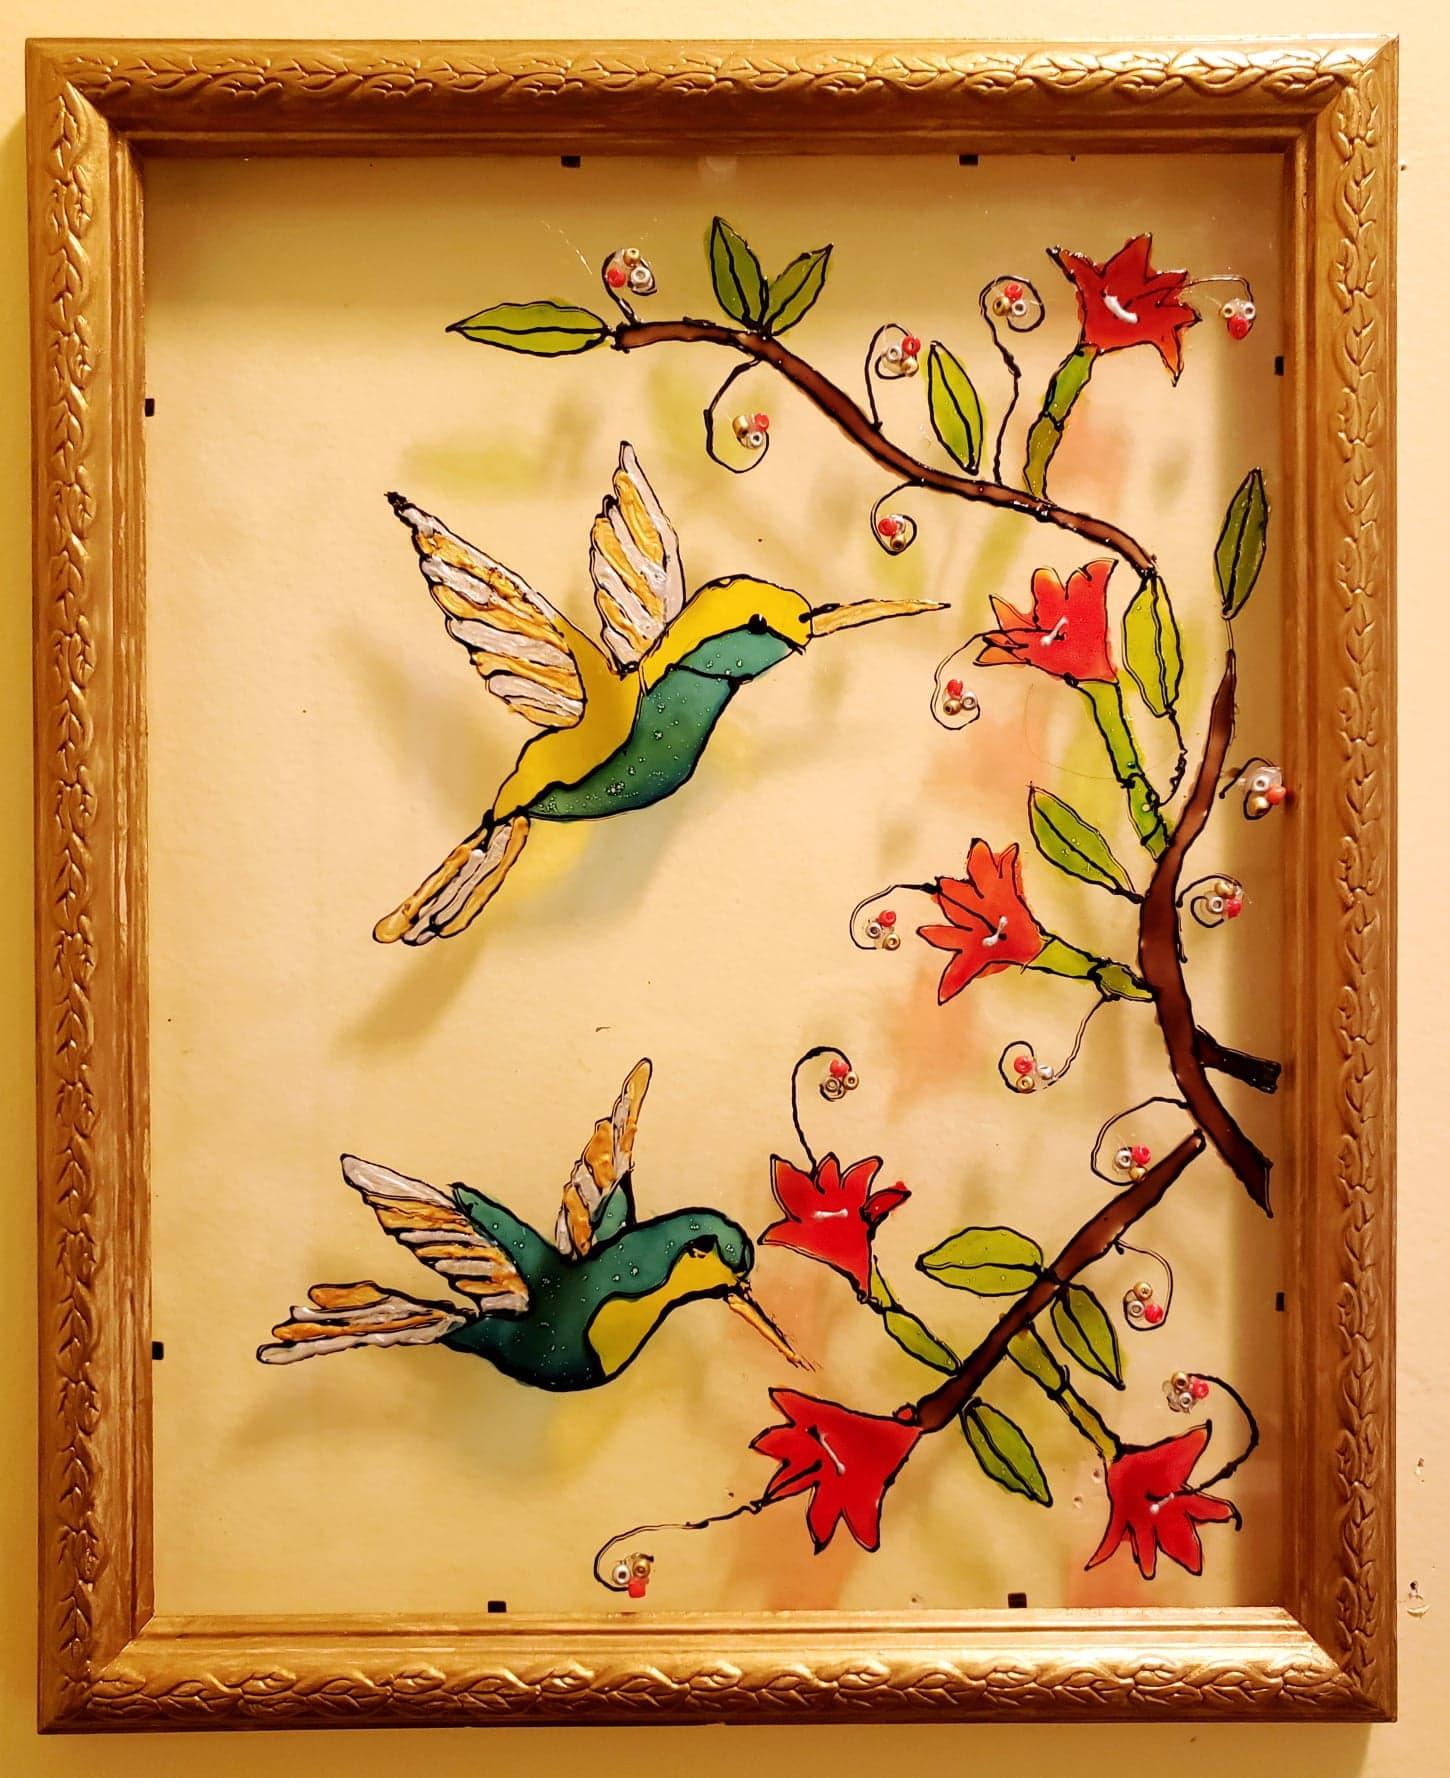 2 - Hummingbird